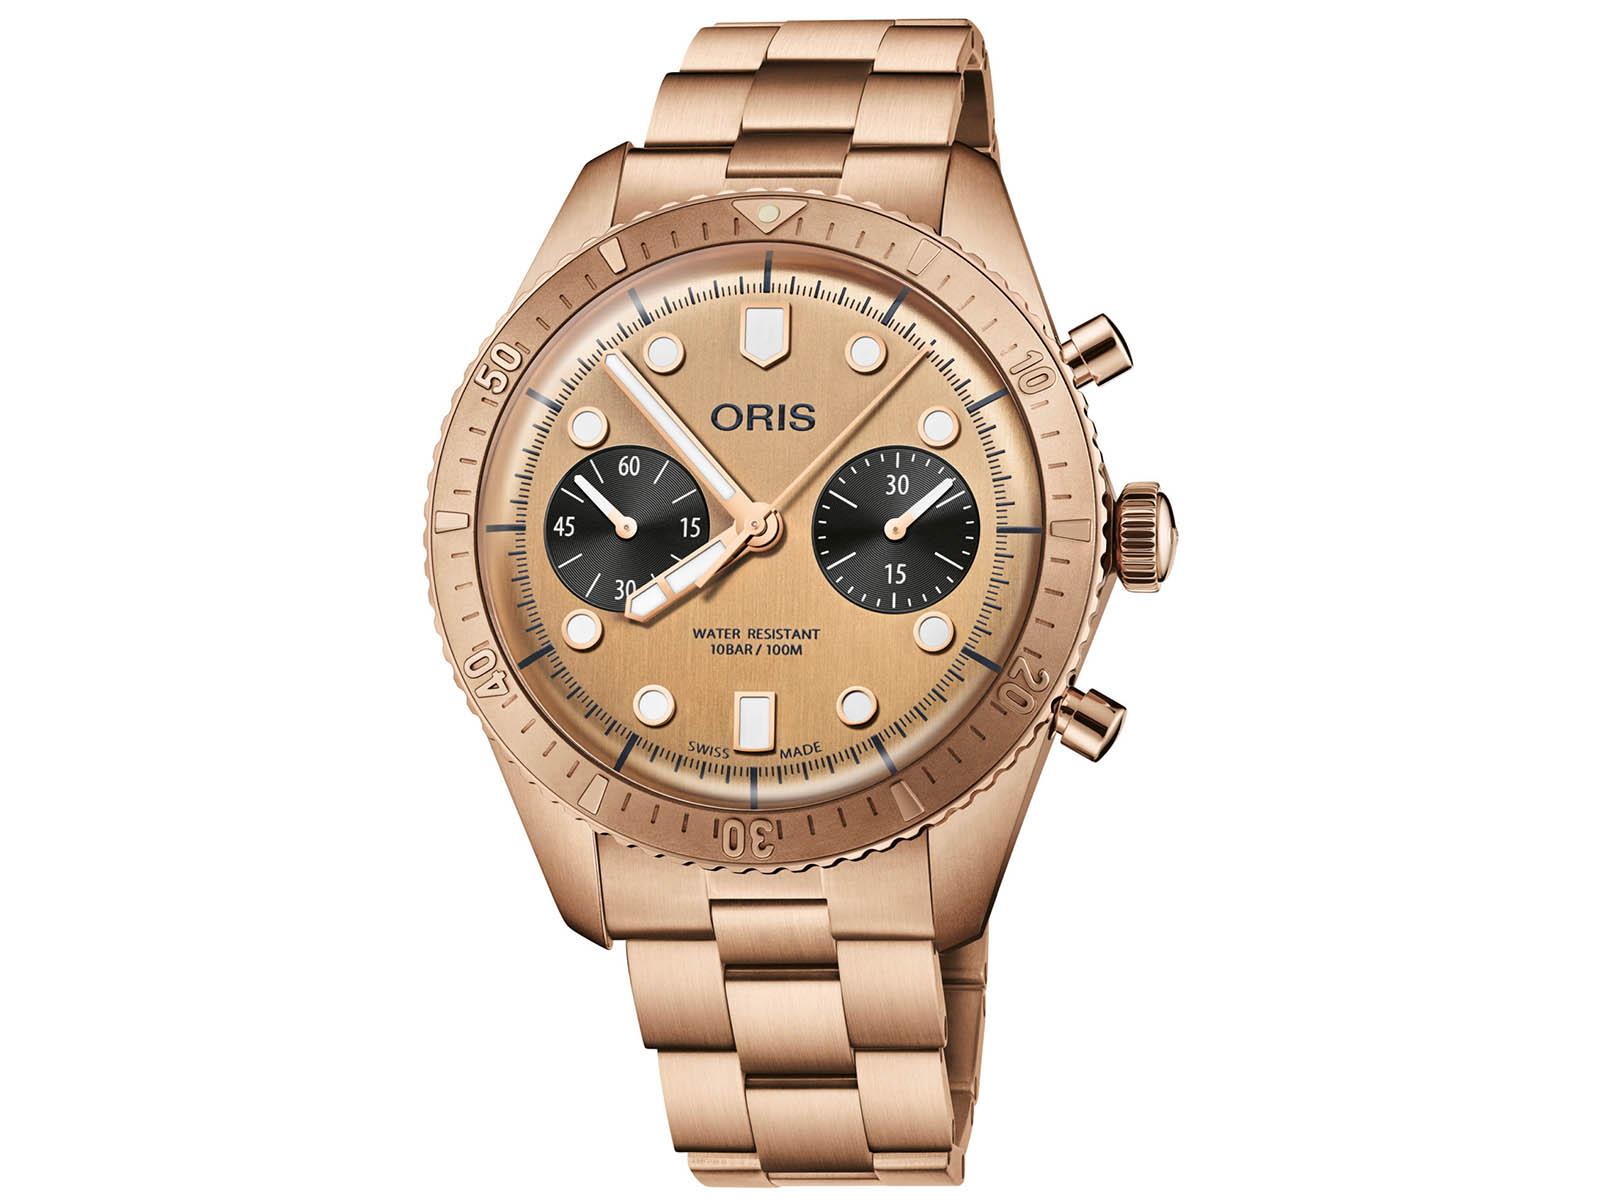 01-771-7744-3182-set-oris-divers-sixty-five-chronograph-holstein-edition-7.jpg